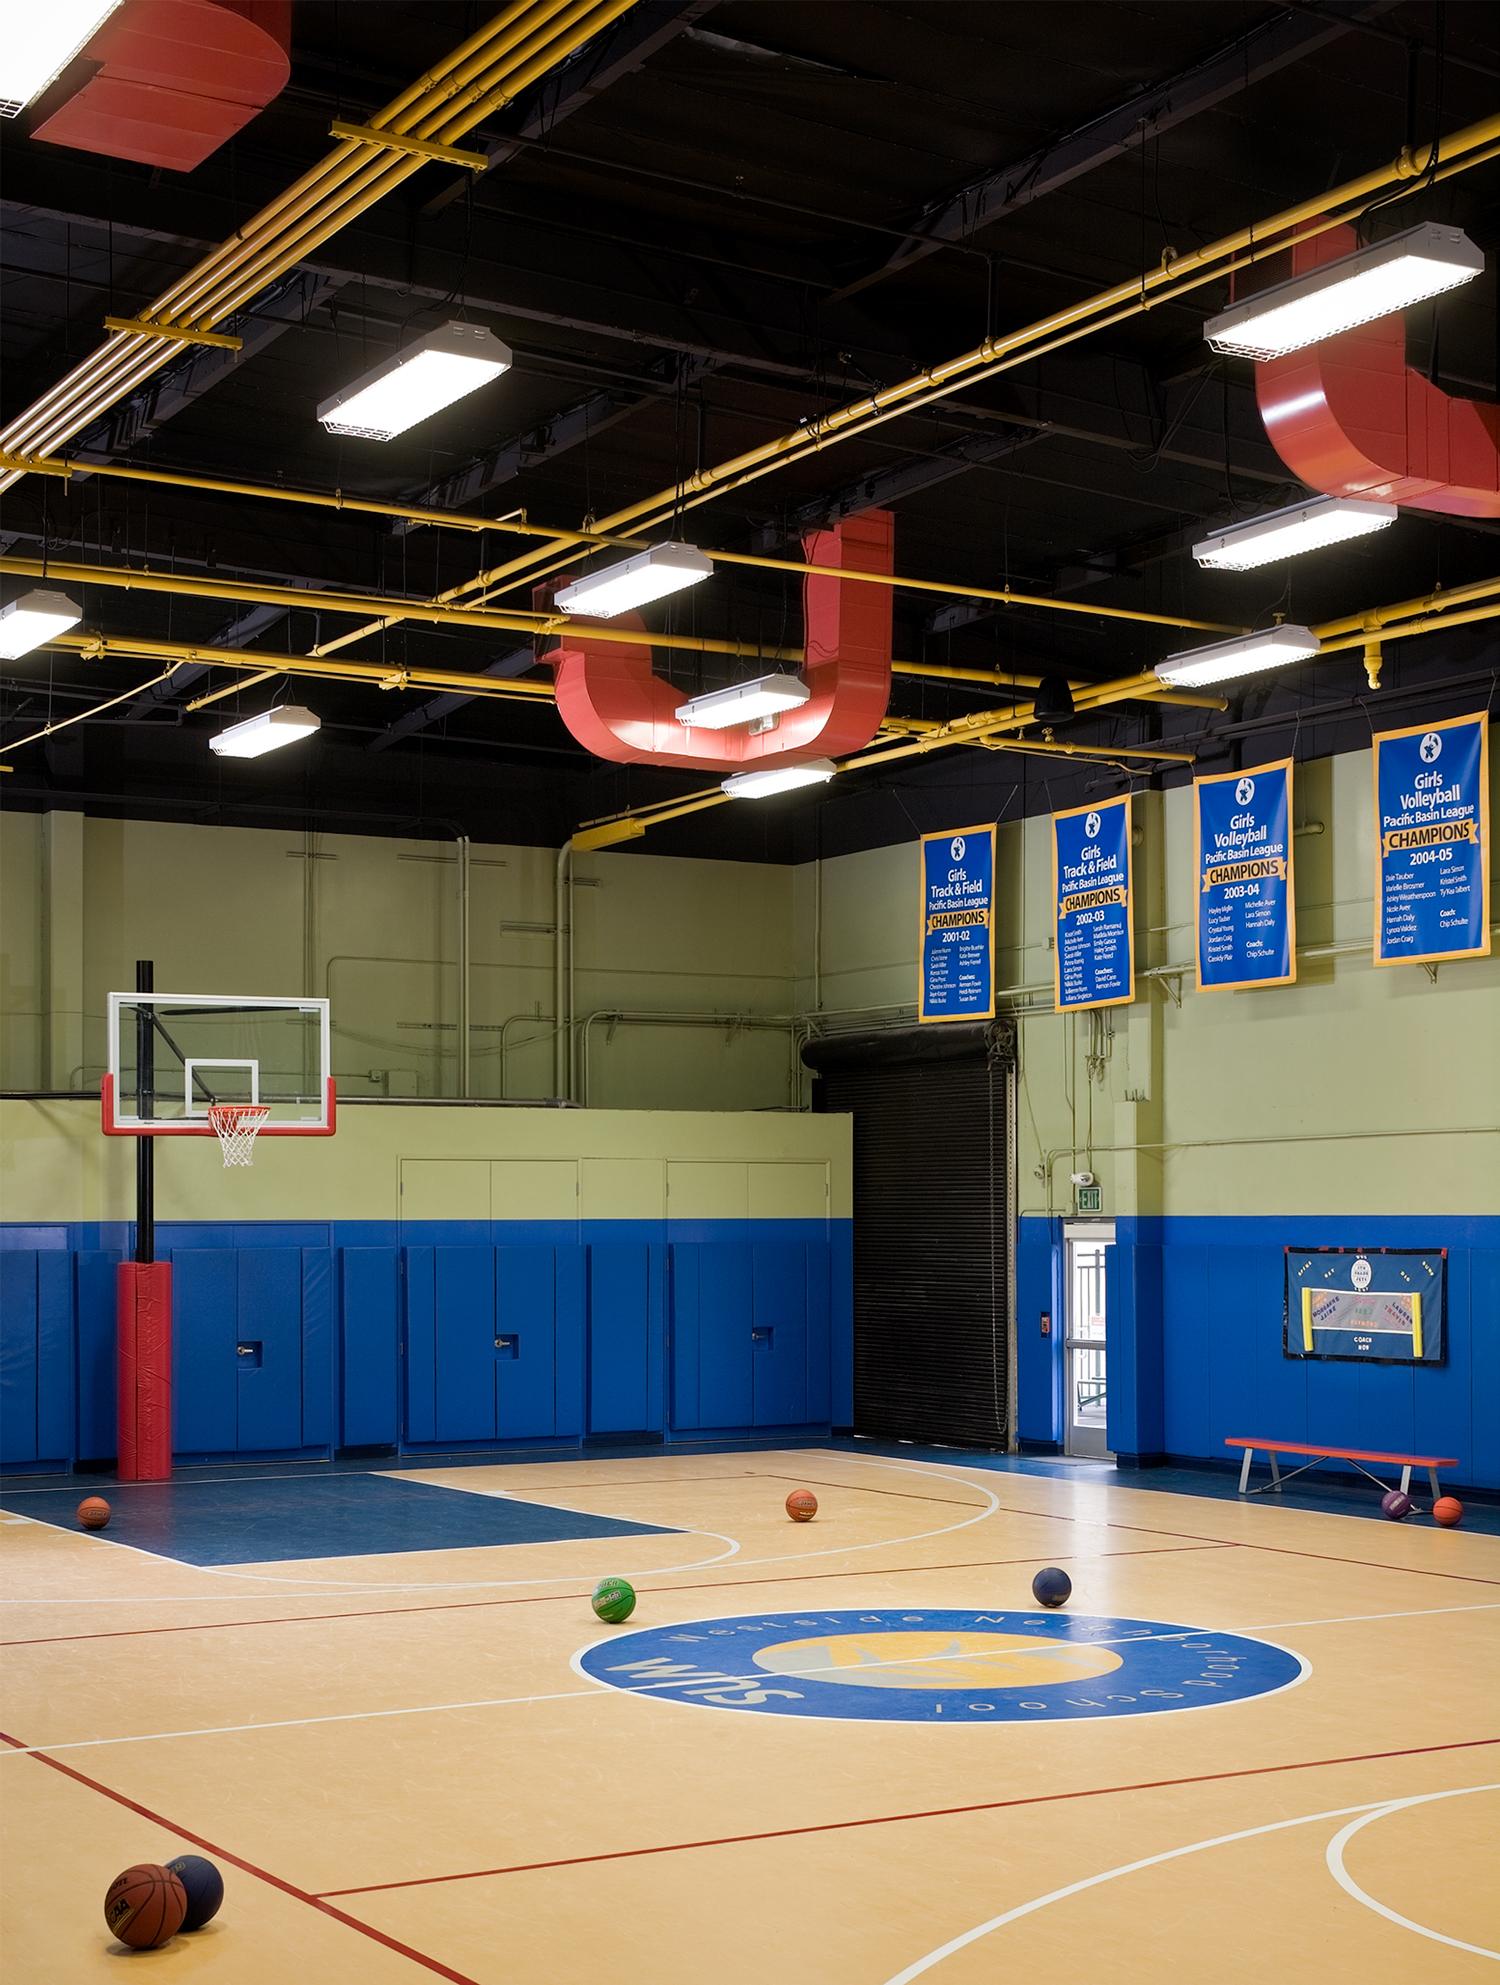 schoolbasketball.jpg